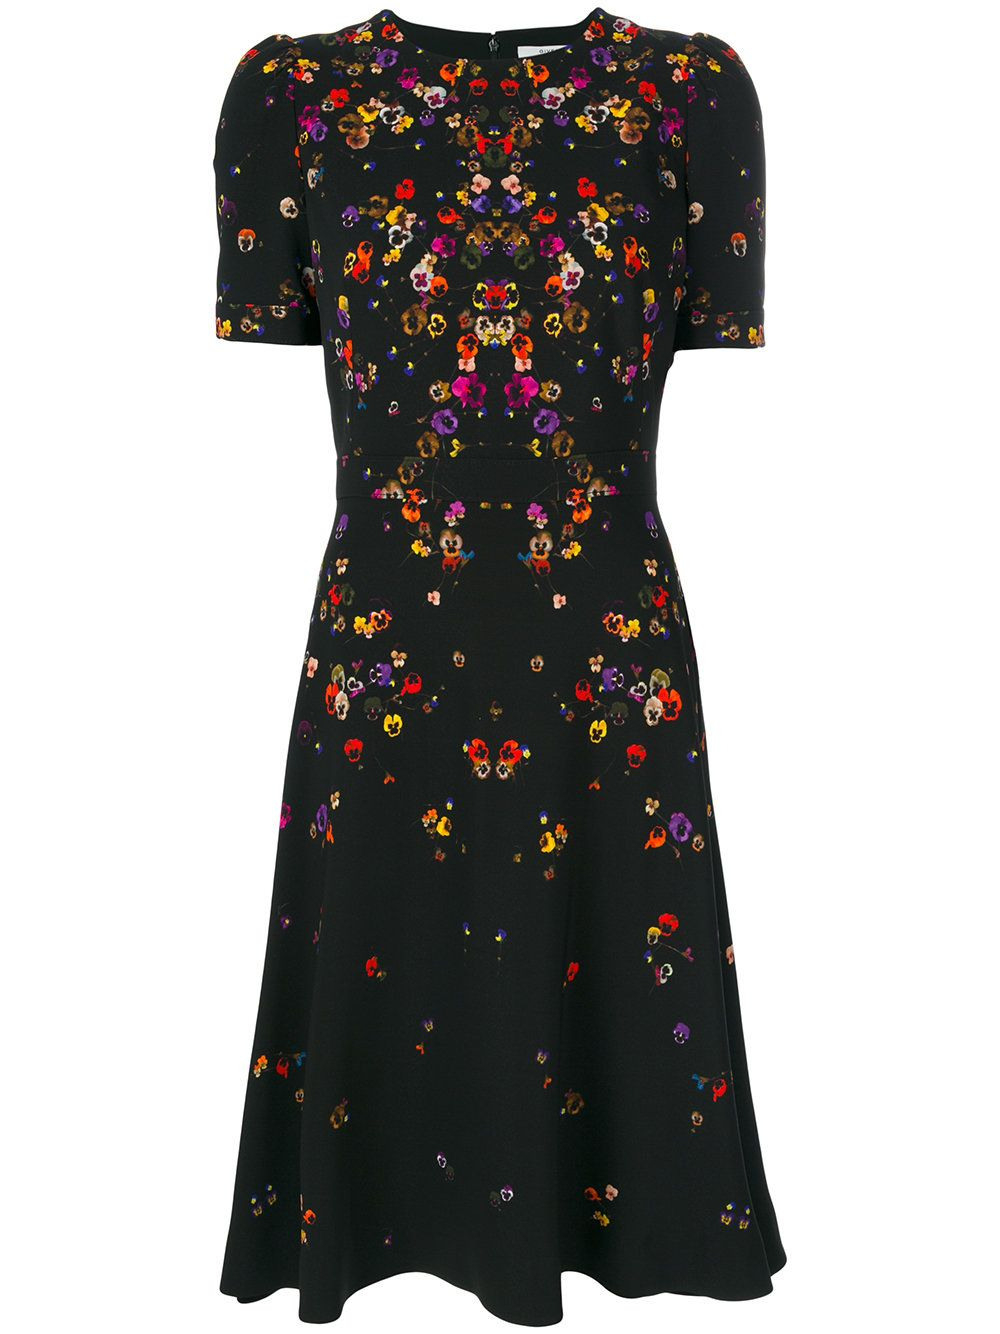 Formal Elegant Abendkleider Expressversand BoutiqueAbend Luxurius Abendkleider Expressversand Boutique